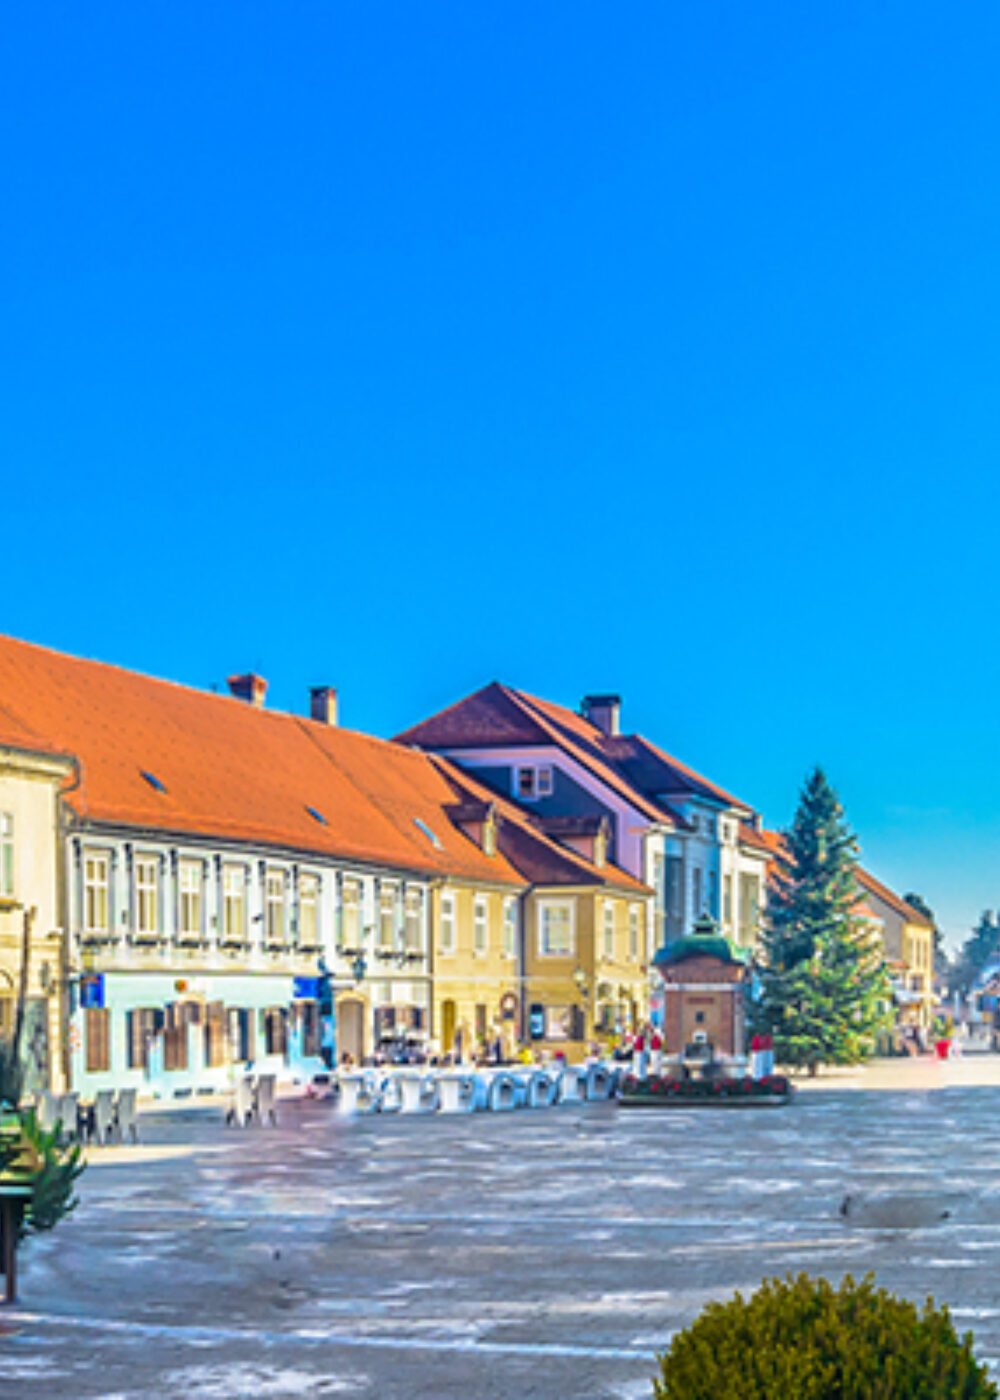 Green Motion Car Rental Croatia Samobor Downtown 1440x400